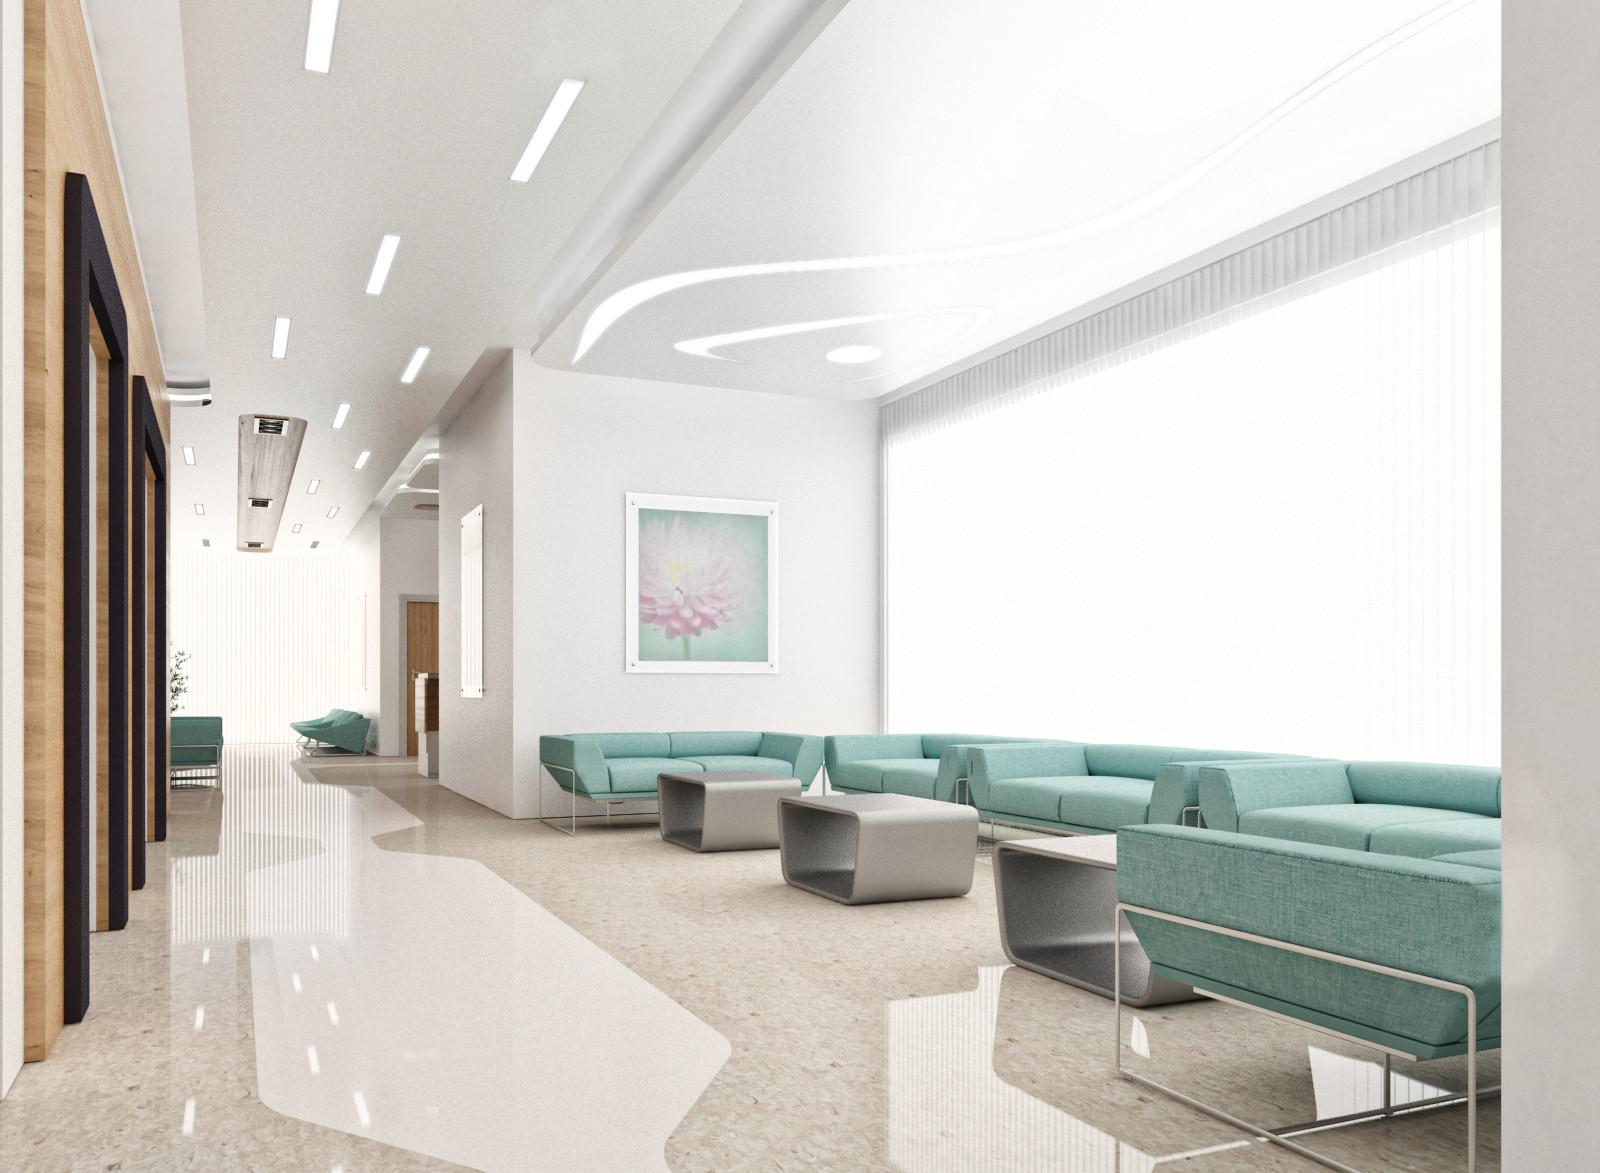 Mustafa arifoglu patient room corridor 1